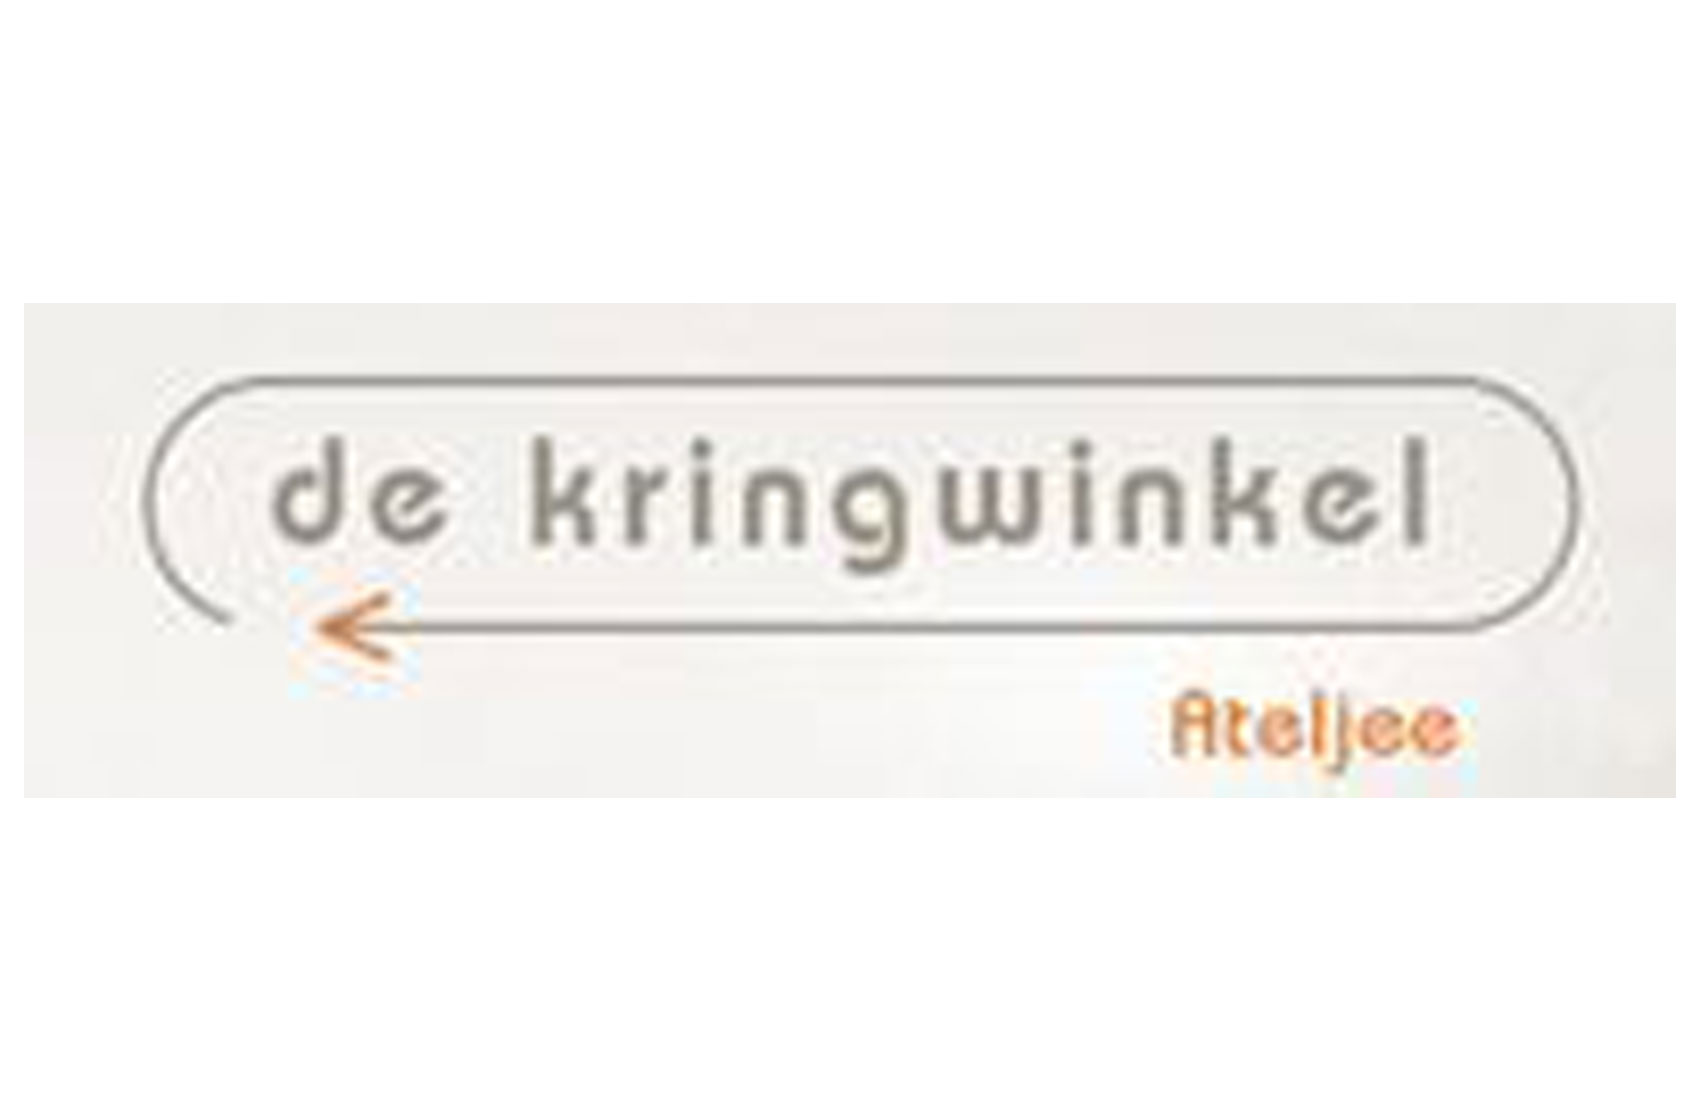 Kringwinkel Ateljee